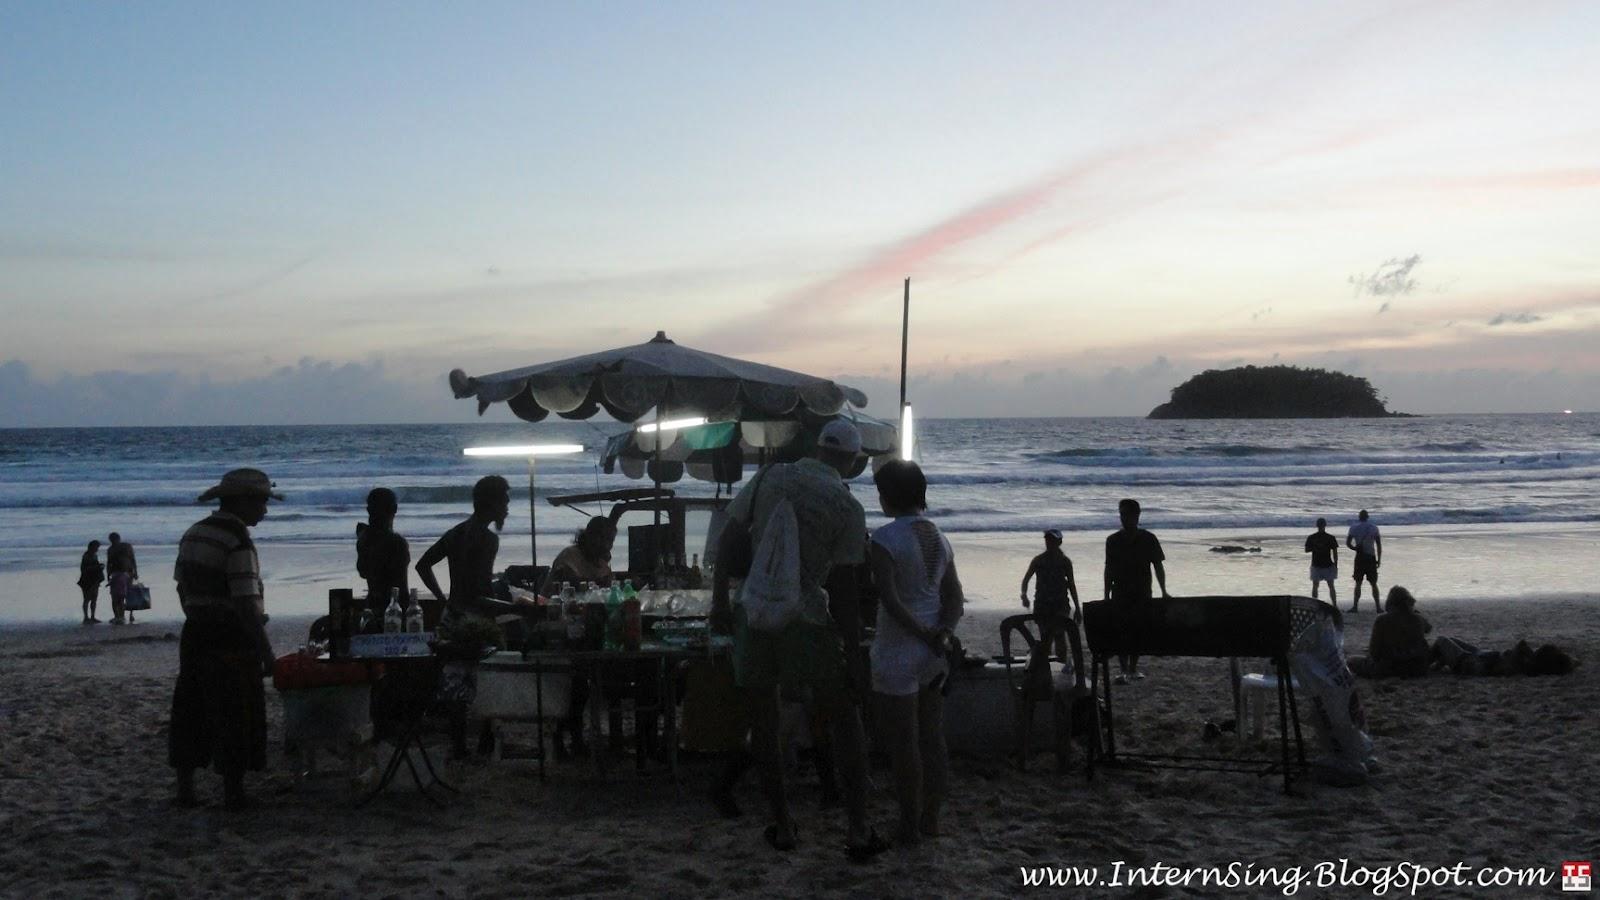 http://3.bp.blogspot.com/-H3MYMLrq9RY/UDSYvMPU4uI/AAAAAAAACnk/2JX98B22yWw/s1600/vacances-phuket-paya-beach-plage-DSC05008.JPG